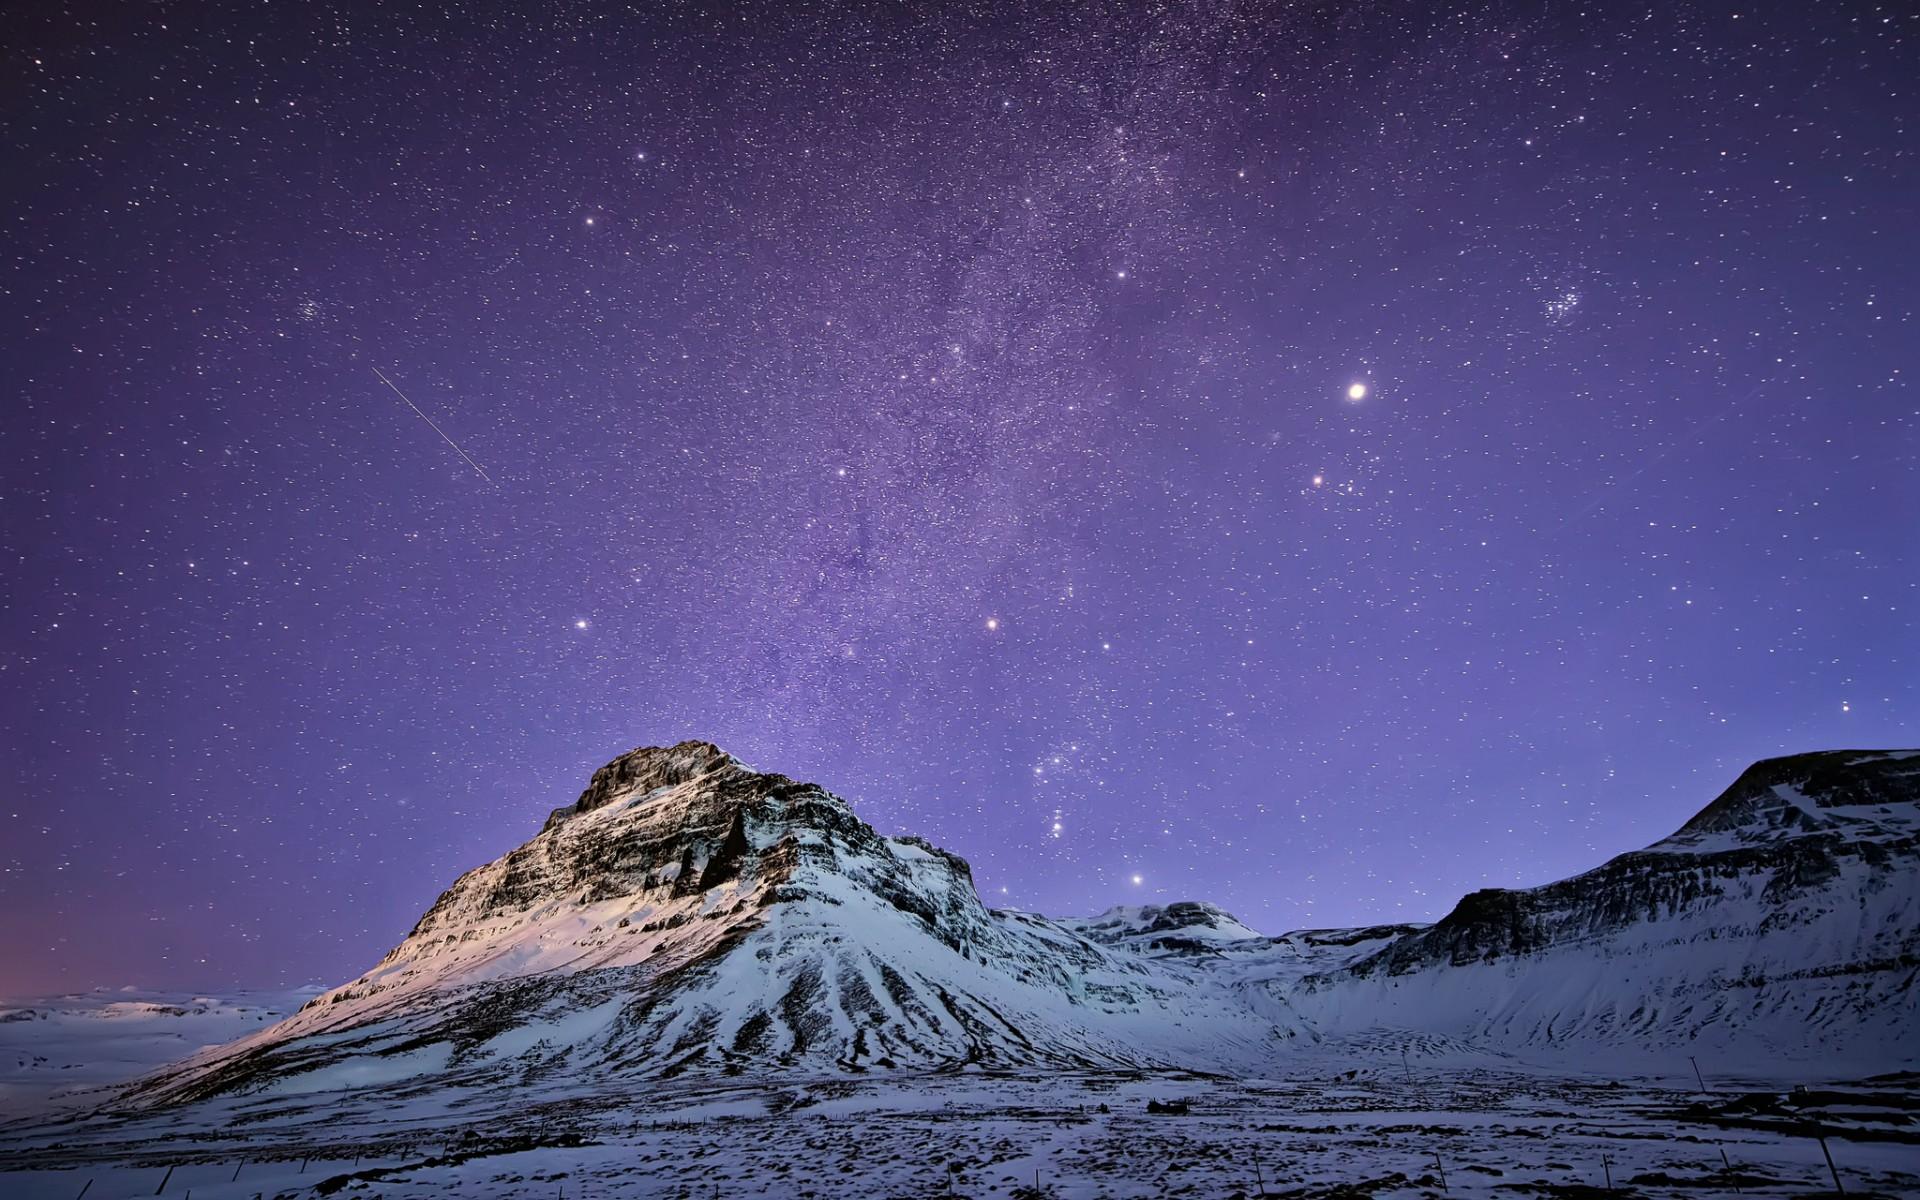 Fotografias de estrellas - 1920x1200